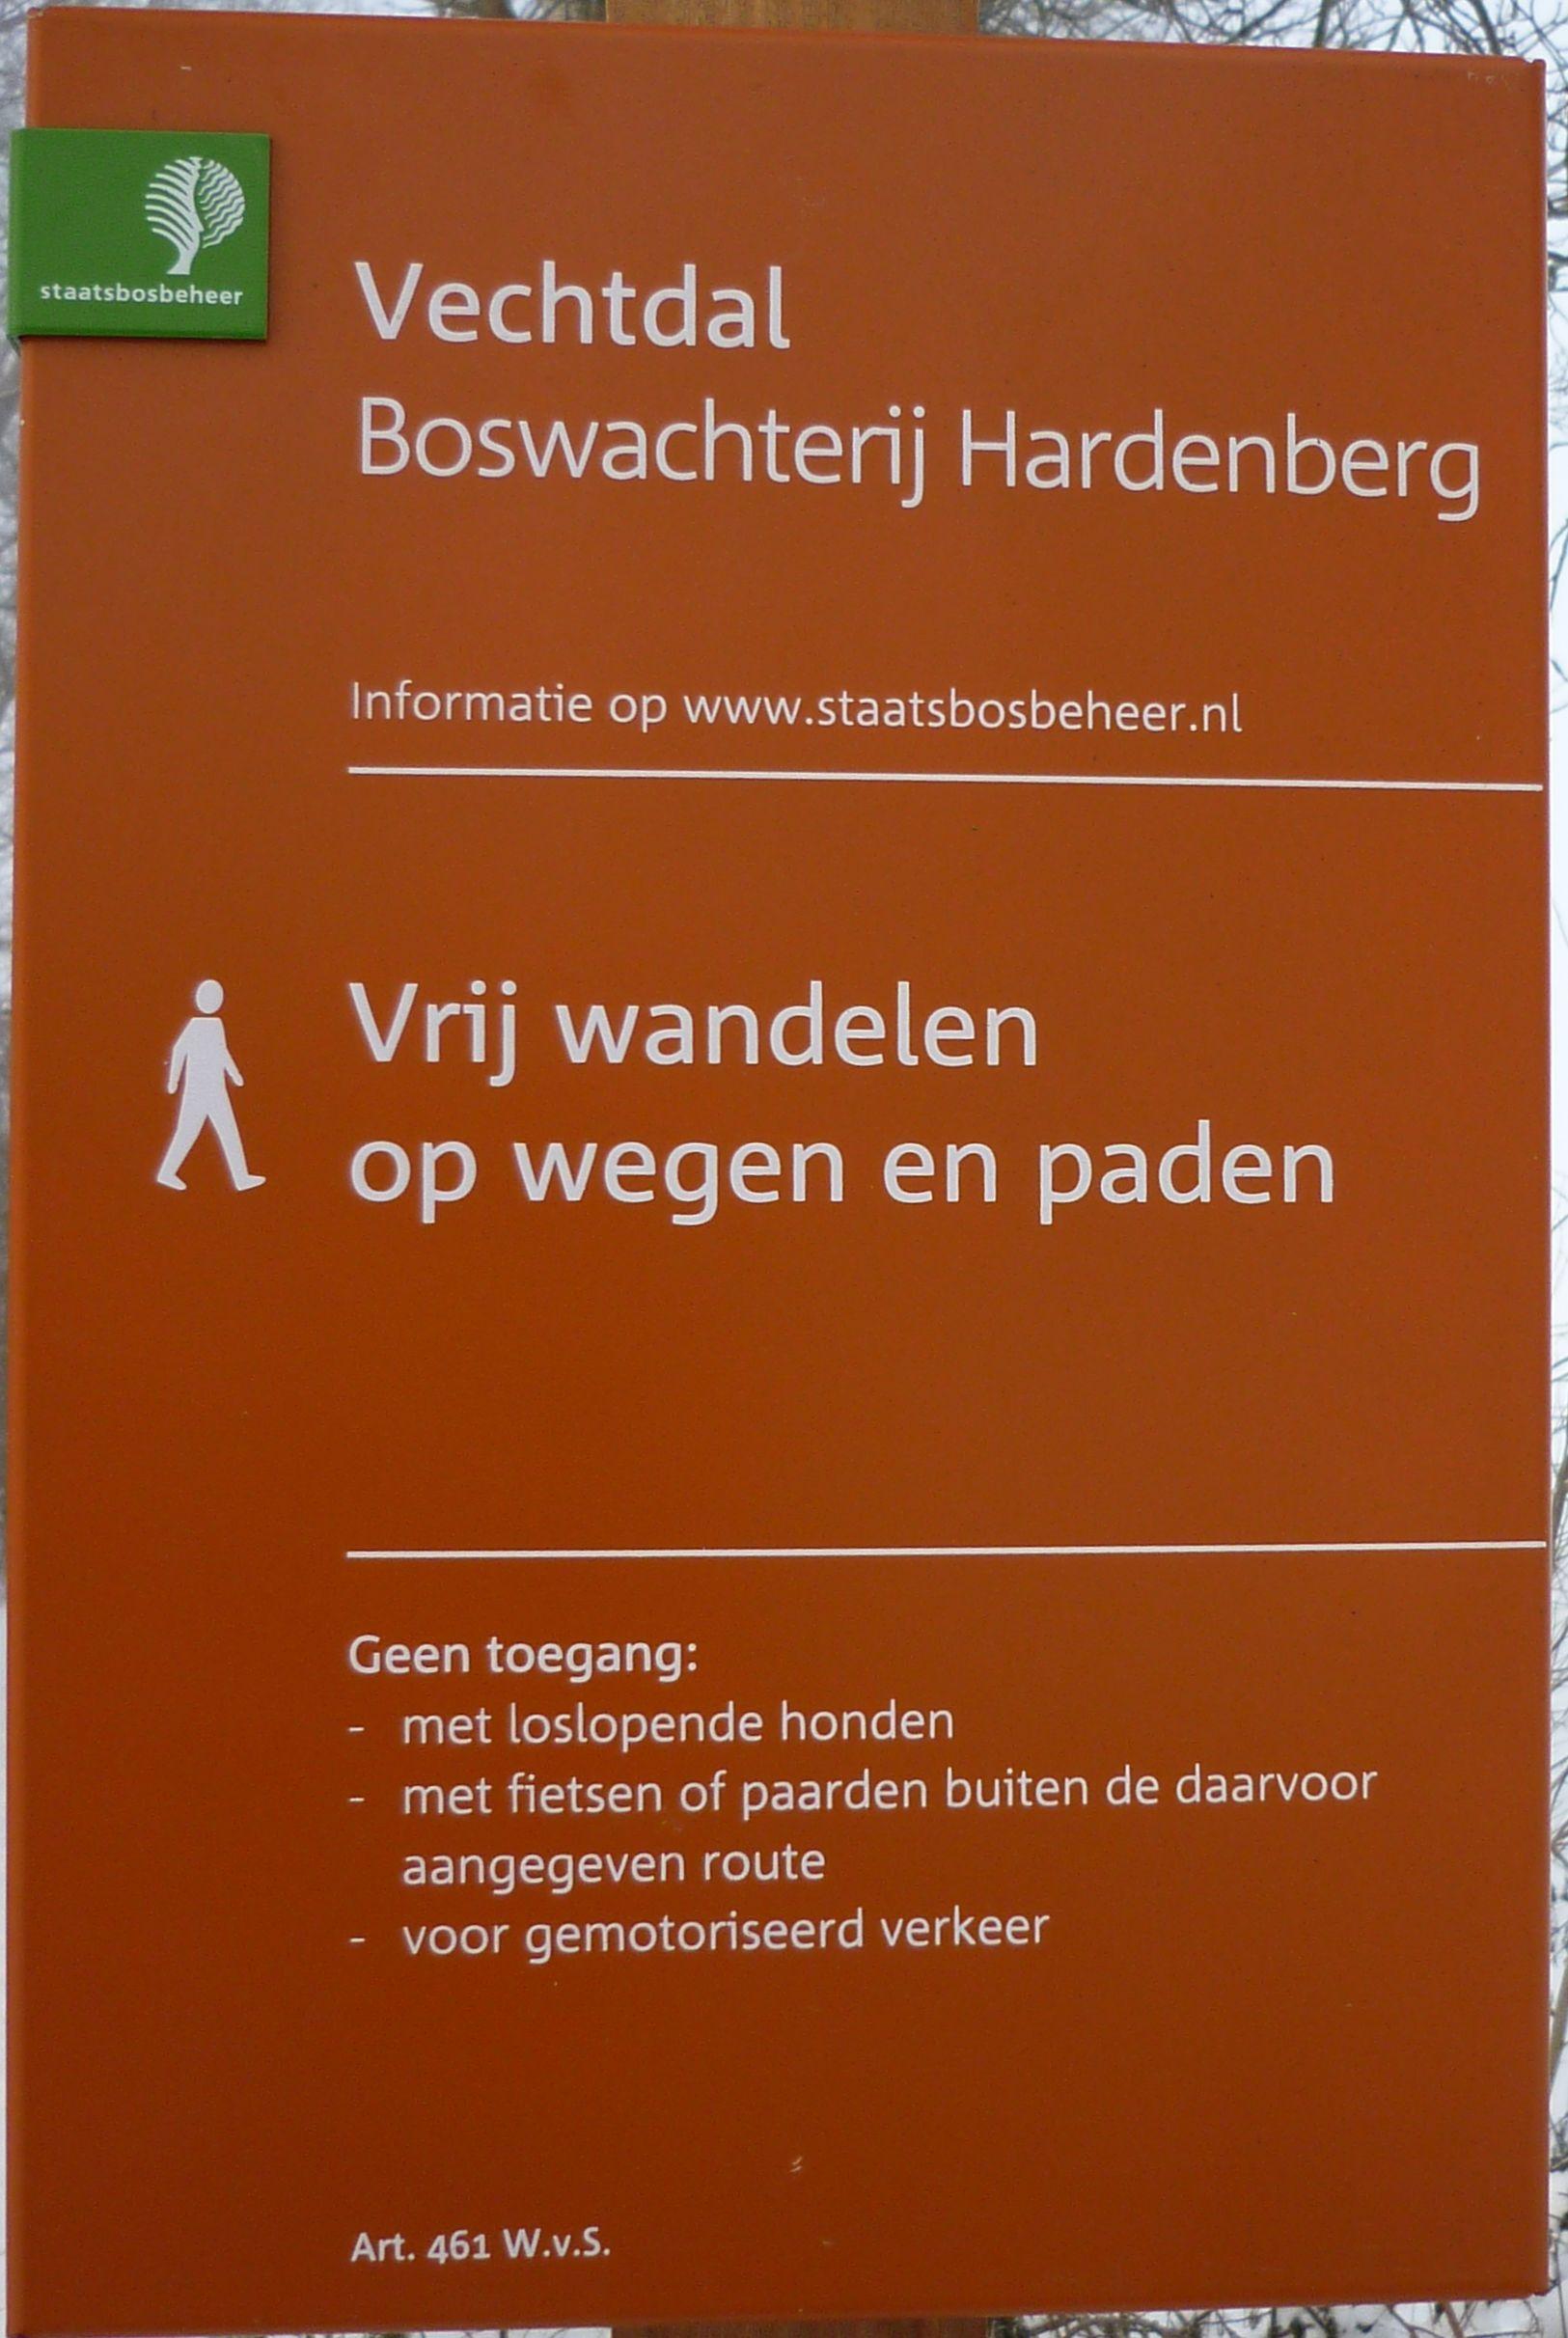 - Bord Staatsbosbeheer Vechtdal.jpg (1625×2423)